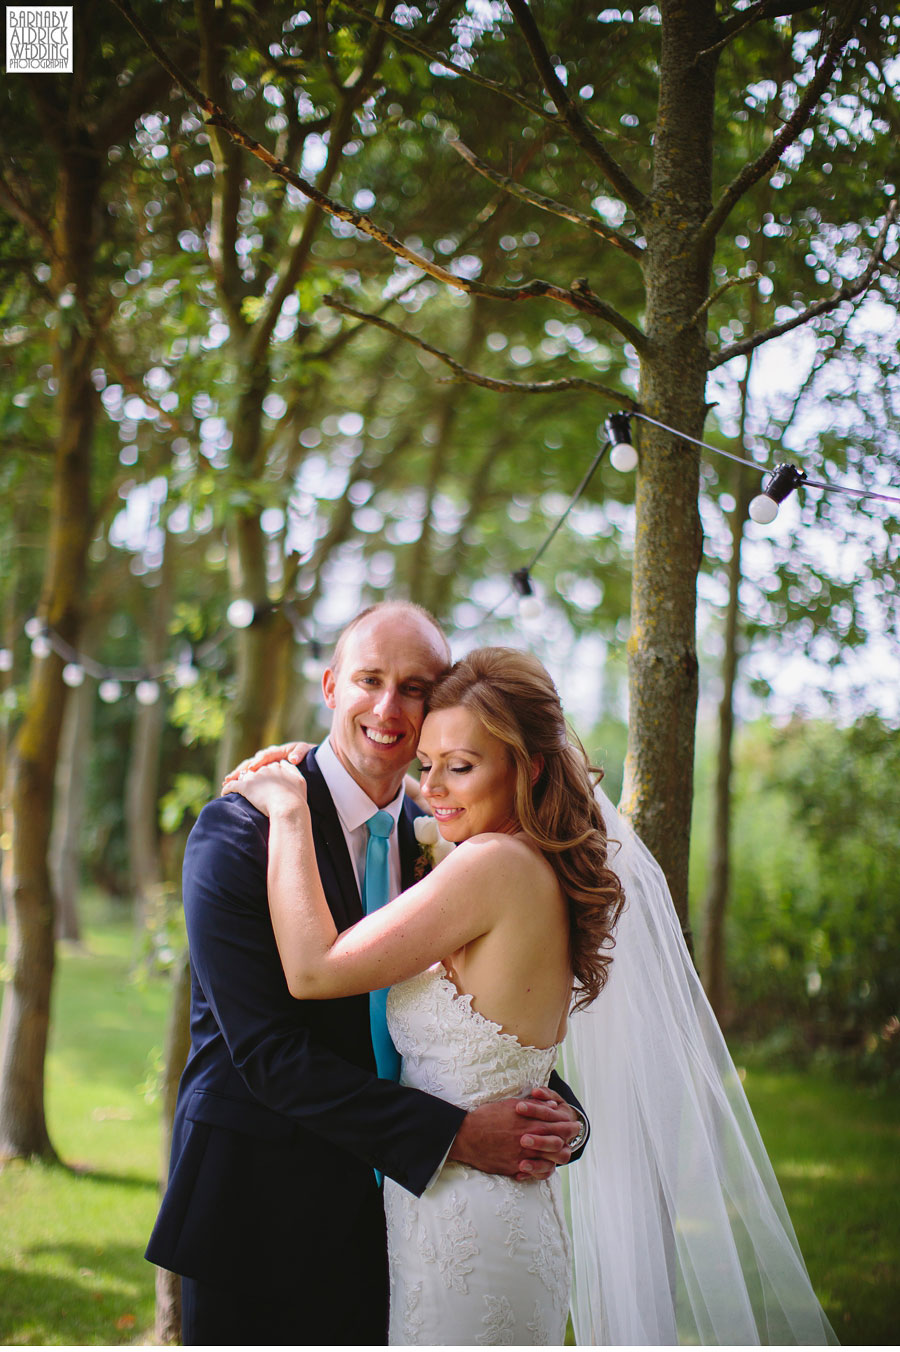 Shustoke Farm Barns Wedding Photography, Shustoke Barns Wedding Photographer, Cripps Barn Solihull Birmingham Wedding, 034